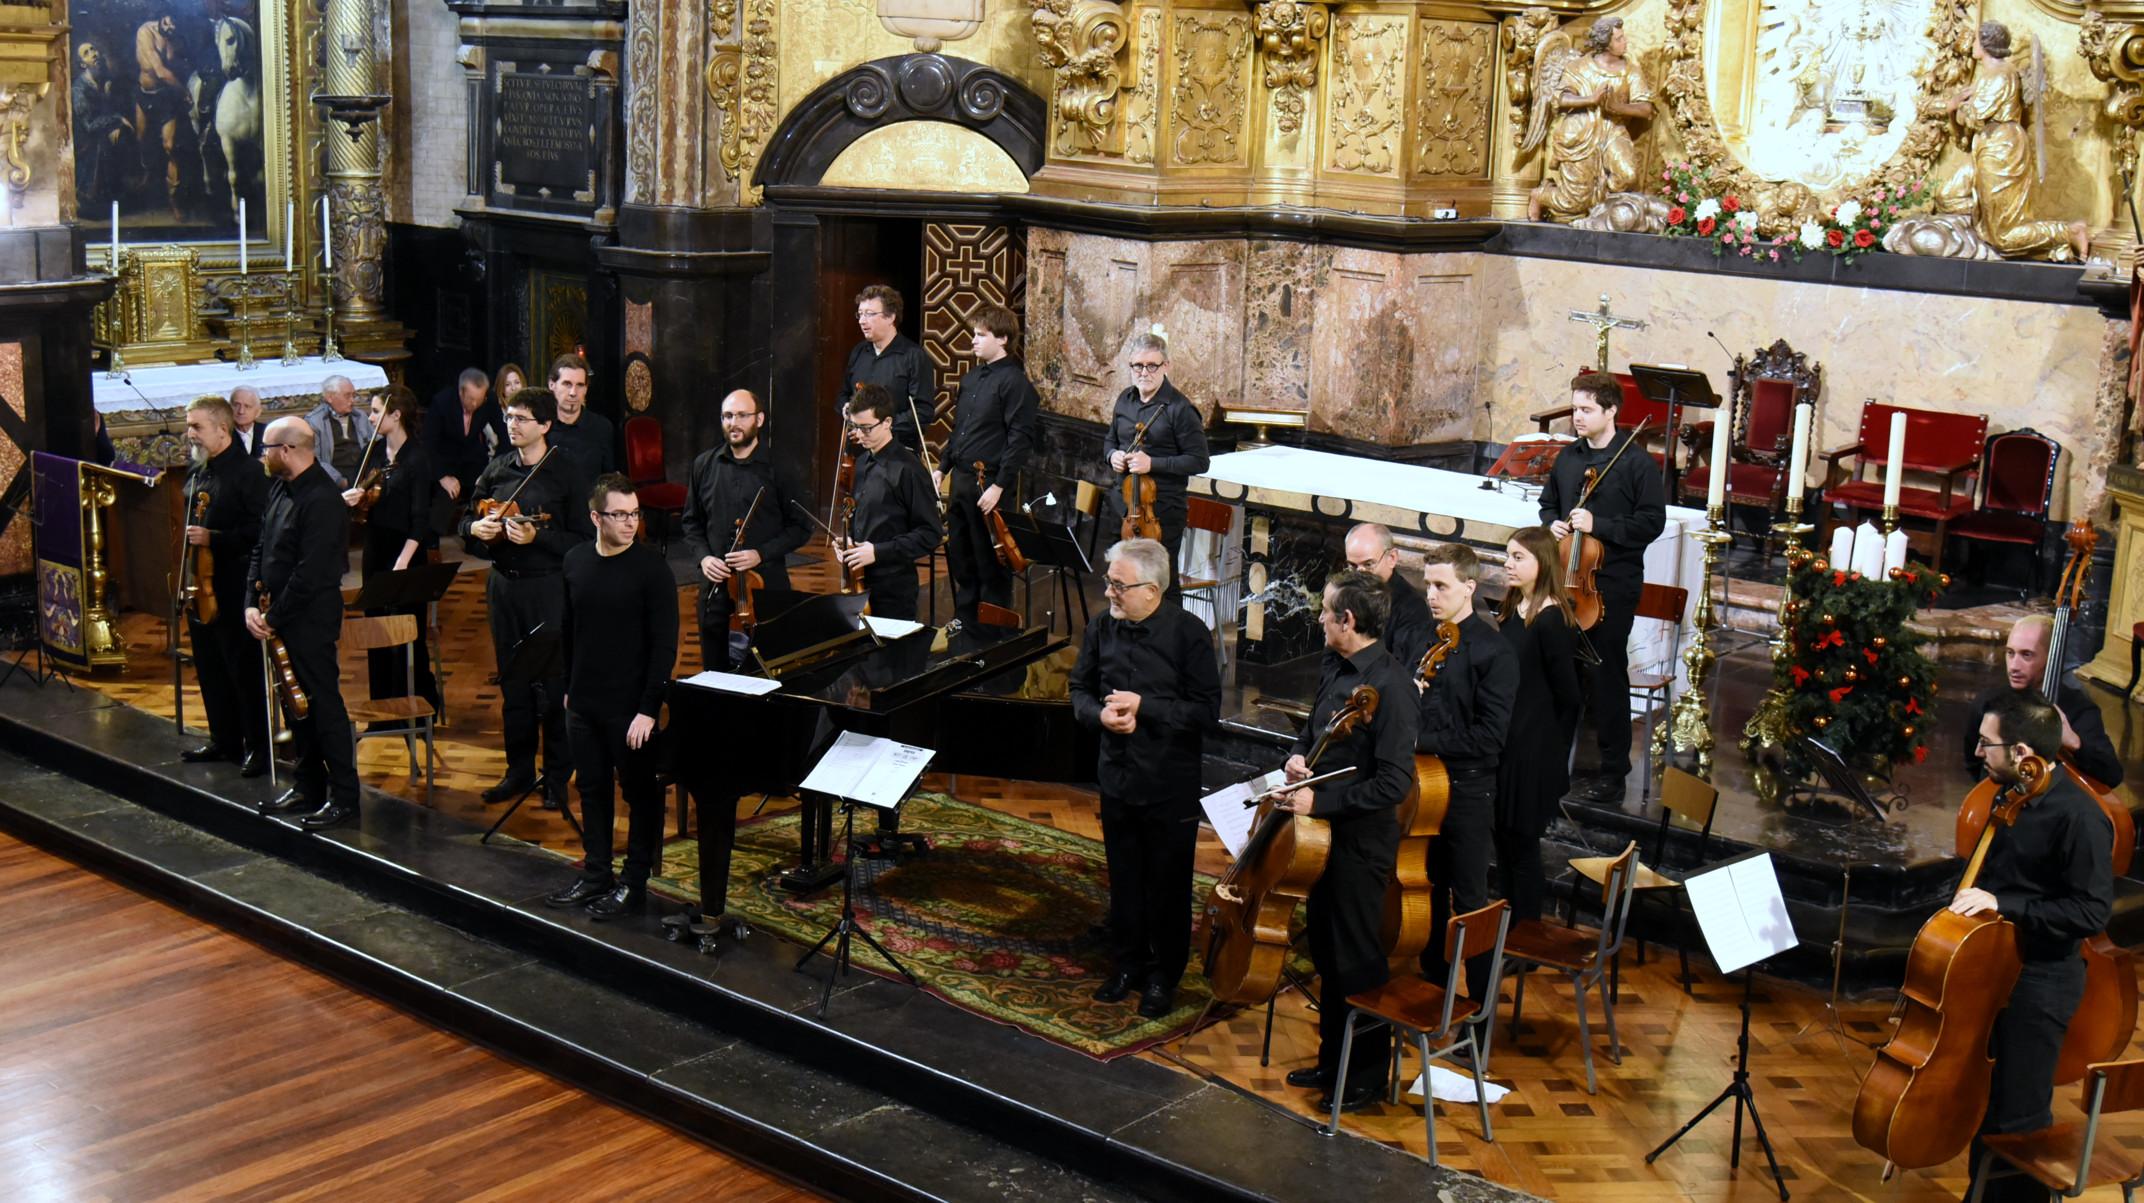 http://orquestatutti.com/wp/wp-content/uploads/2017/12/DSC_3138_01.jpg